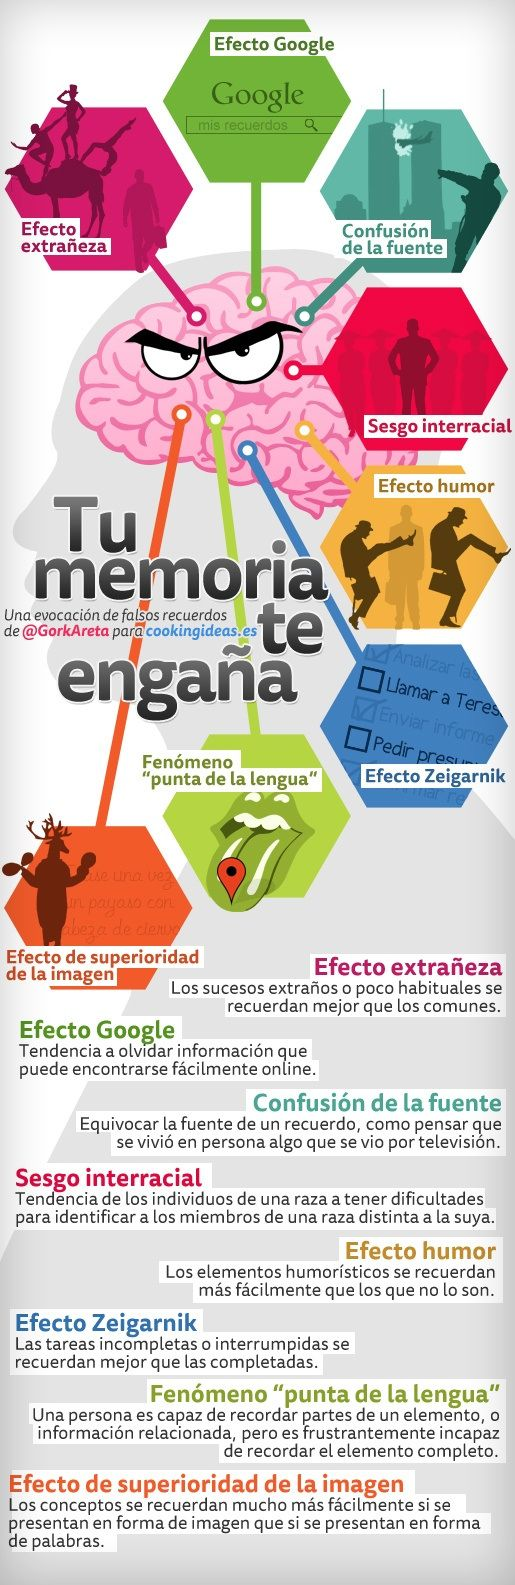 Tu memoria te engaña #infografia #infographic #education #psychology